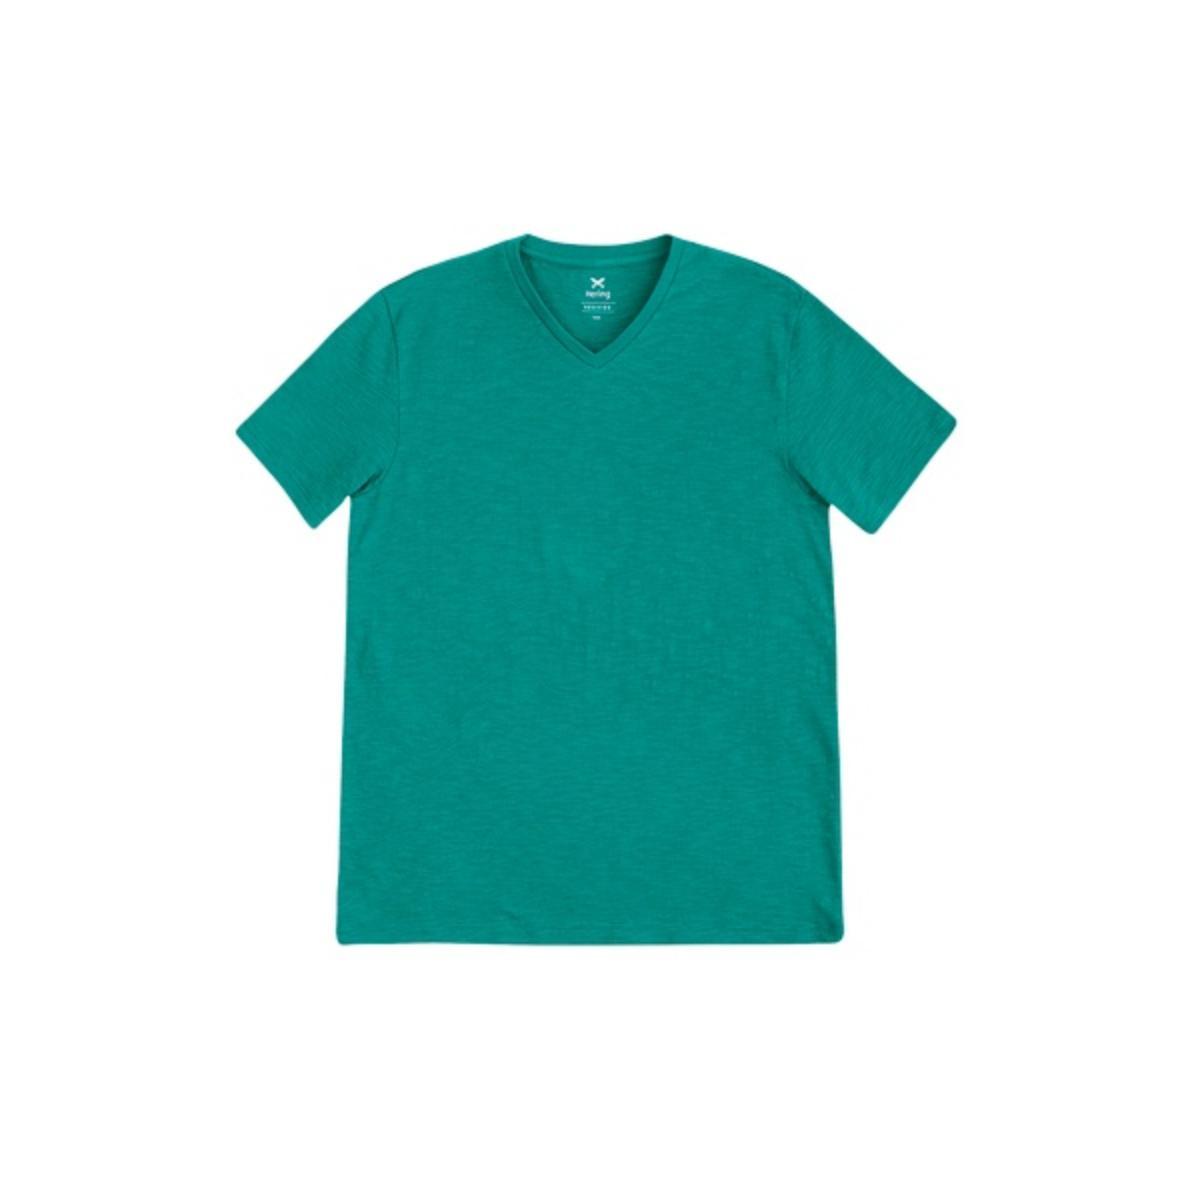 Camisa Masculina Hering N3a7 W9ben Verde